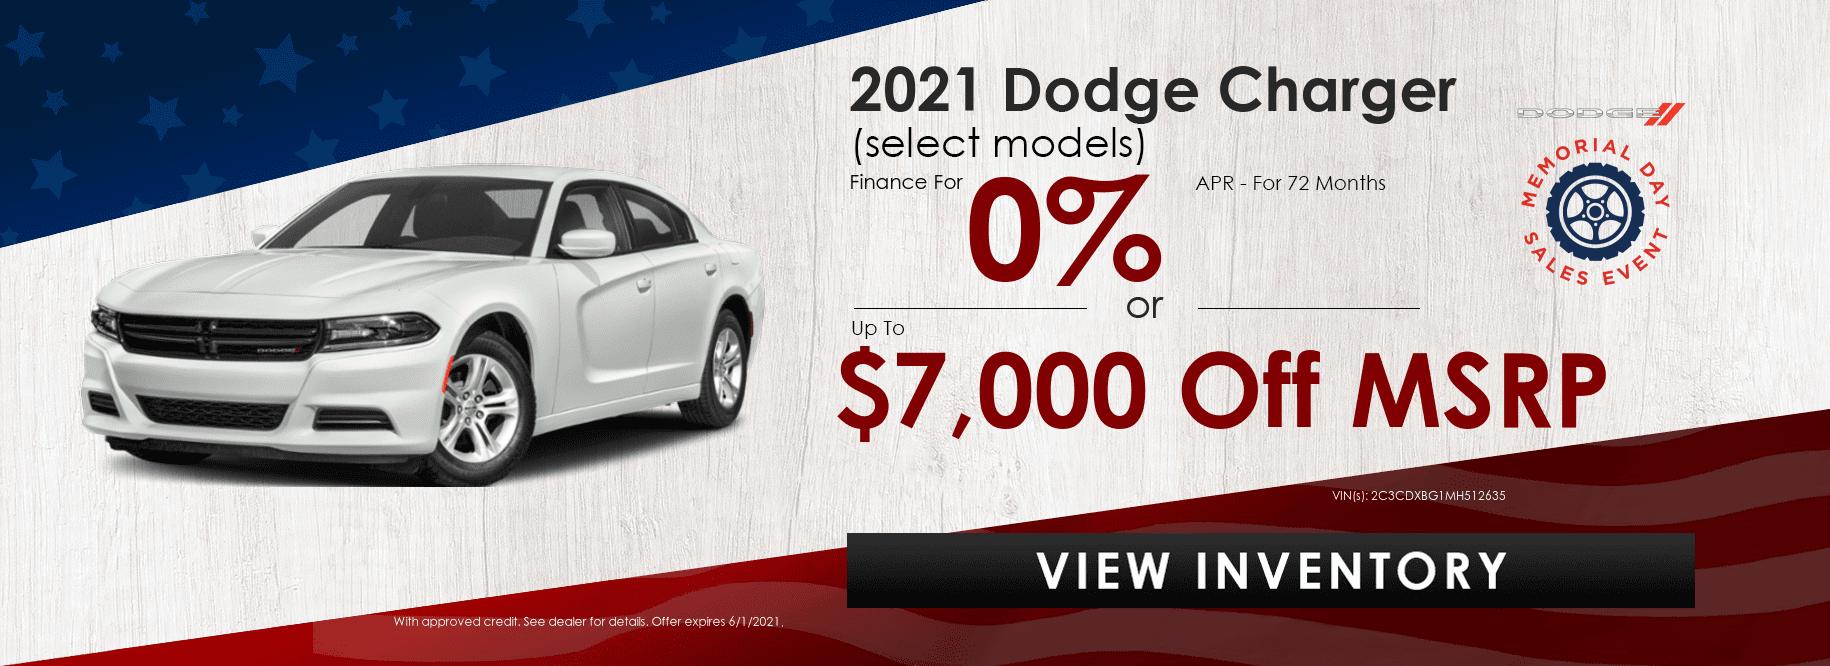 2021-Dodge-Charger-(select-models)-9